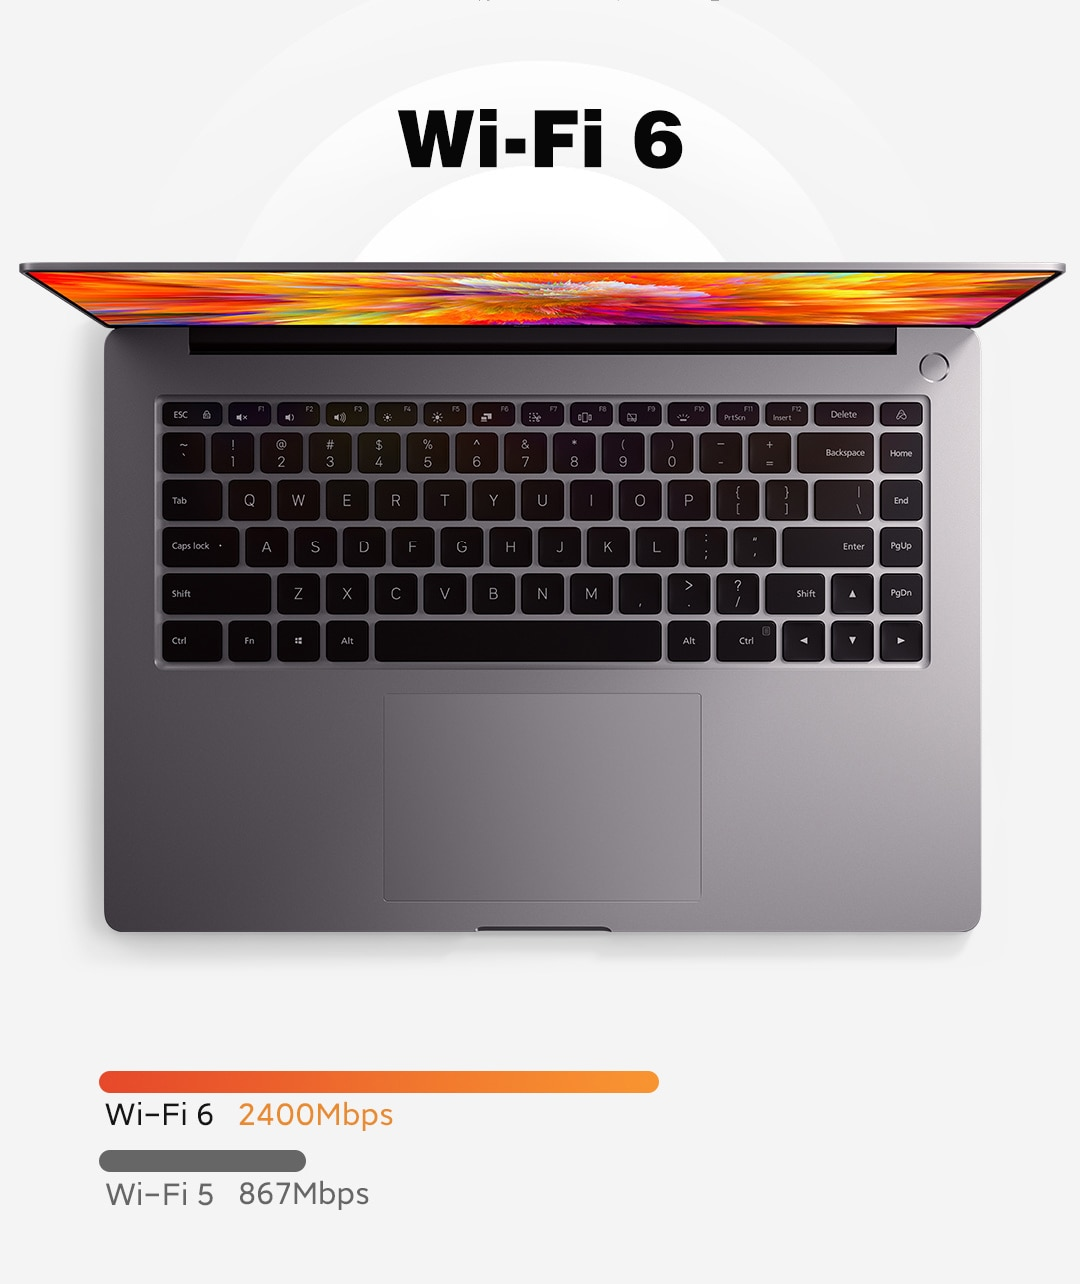 Xiaomi Mi RedmiBook Laptop Pro 15.6inch Intel Core i5-11300H 16GB DDR4 512GB SSD Intel Iris Xe 3.2K 90Hz Win10 Notebook 100%sRGB